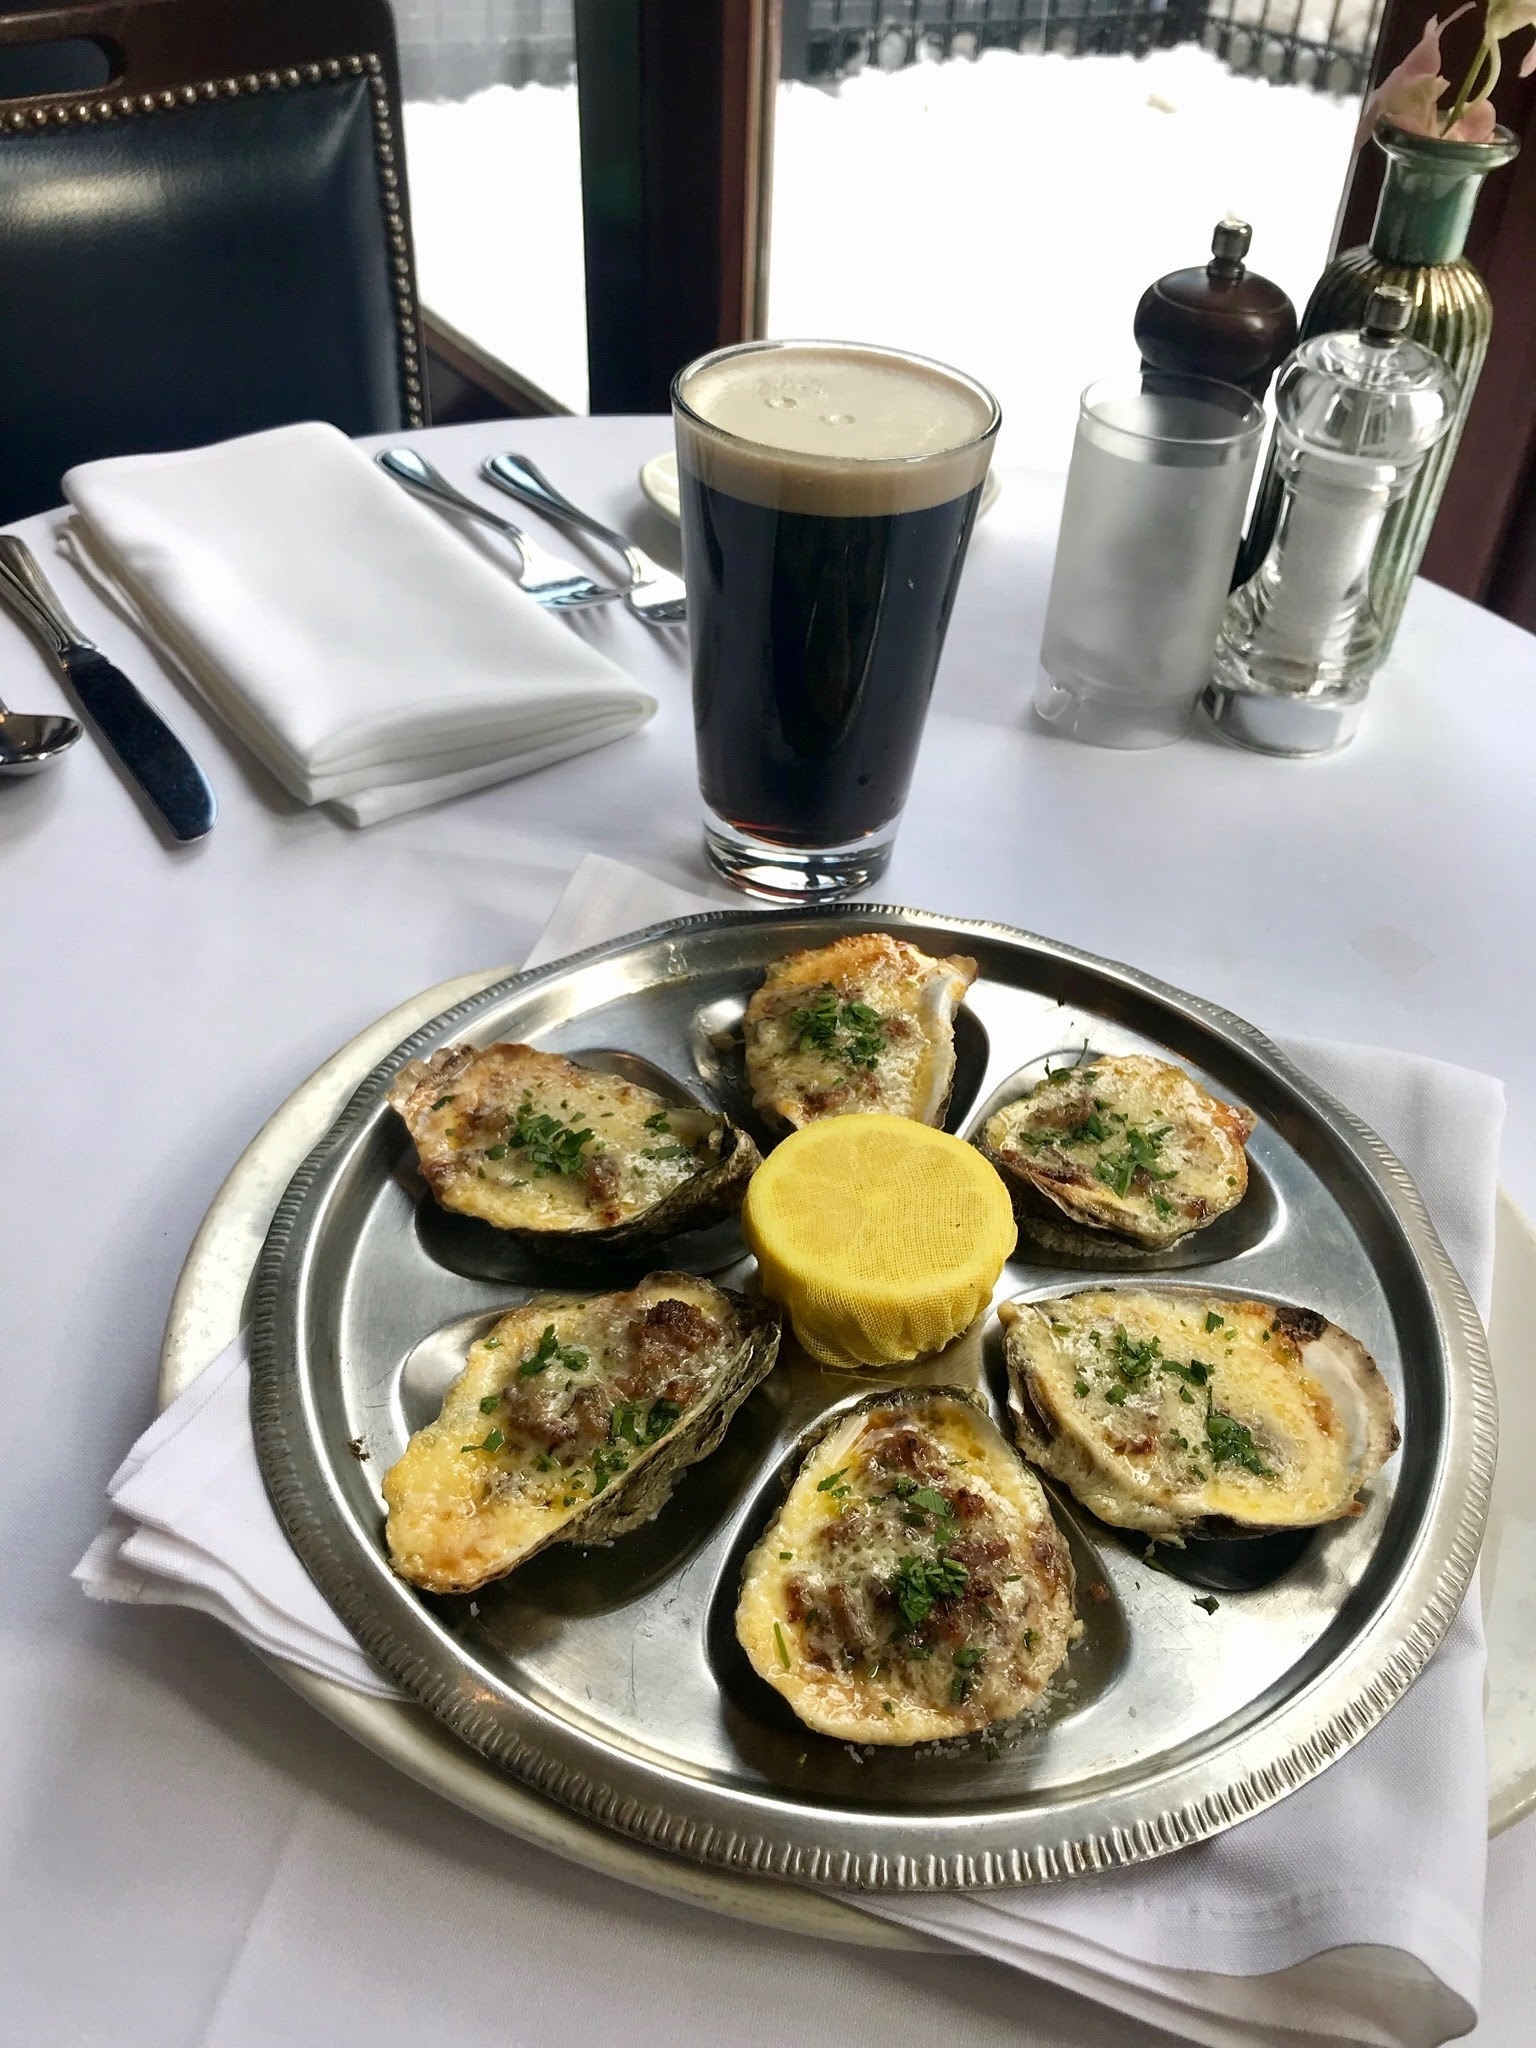 Oysters Kirkpatrick by Chef Dan Billo of Atlantic Fish. Photo by Atlantic Fish